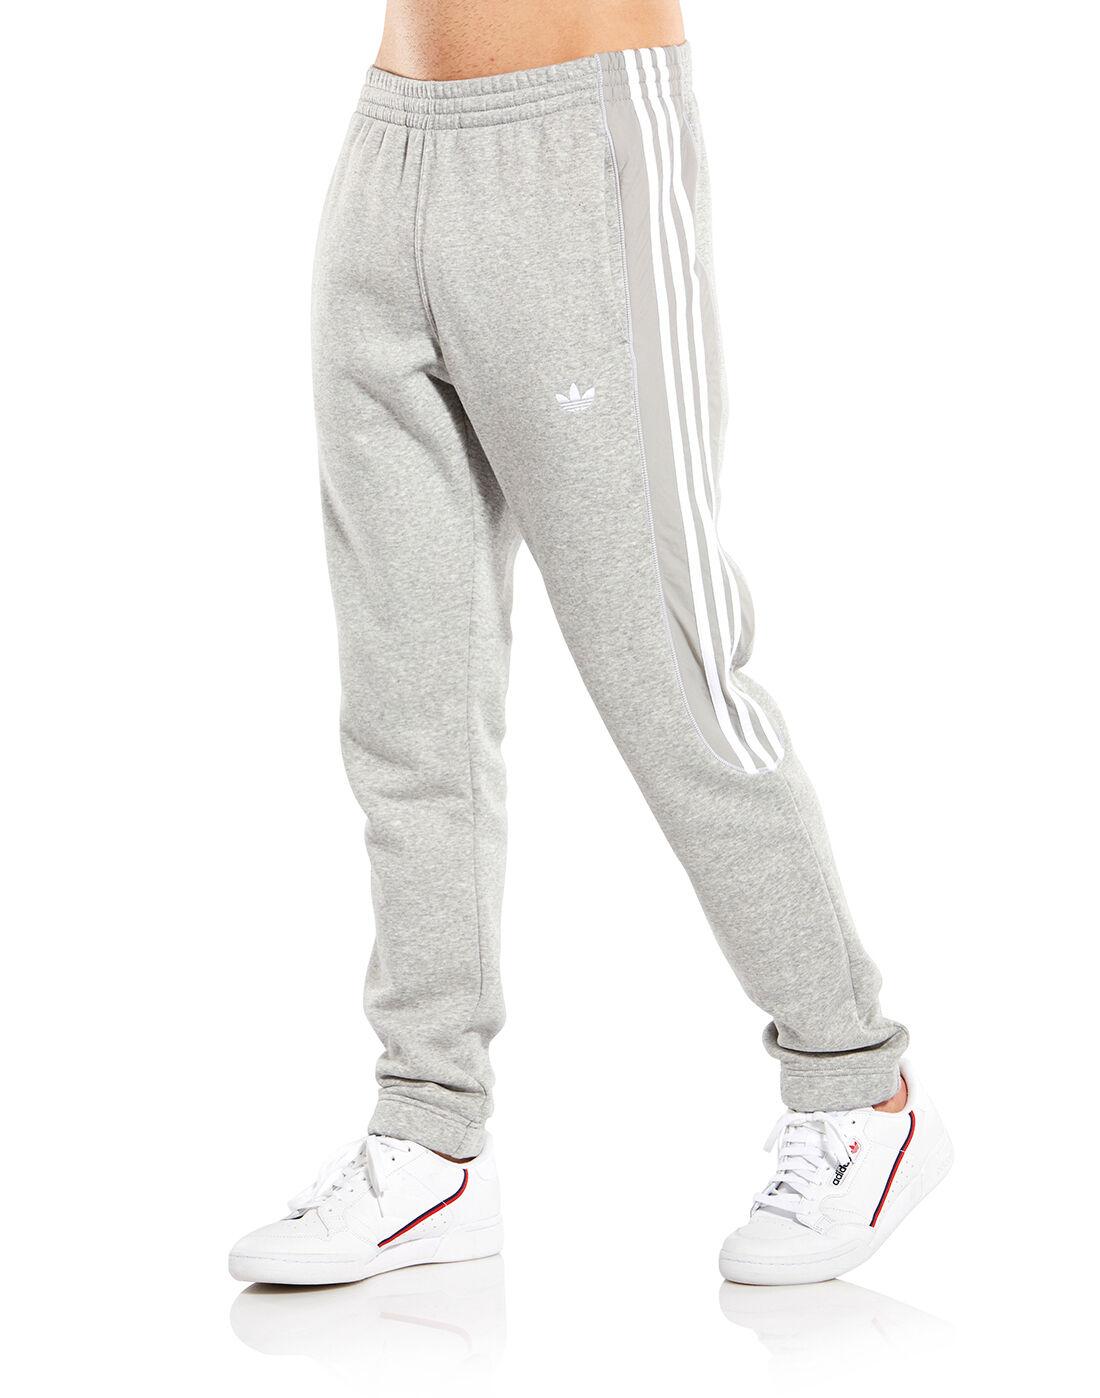 Grey adidas Originals Radkin Pants